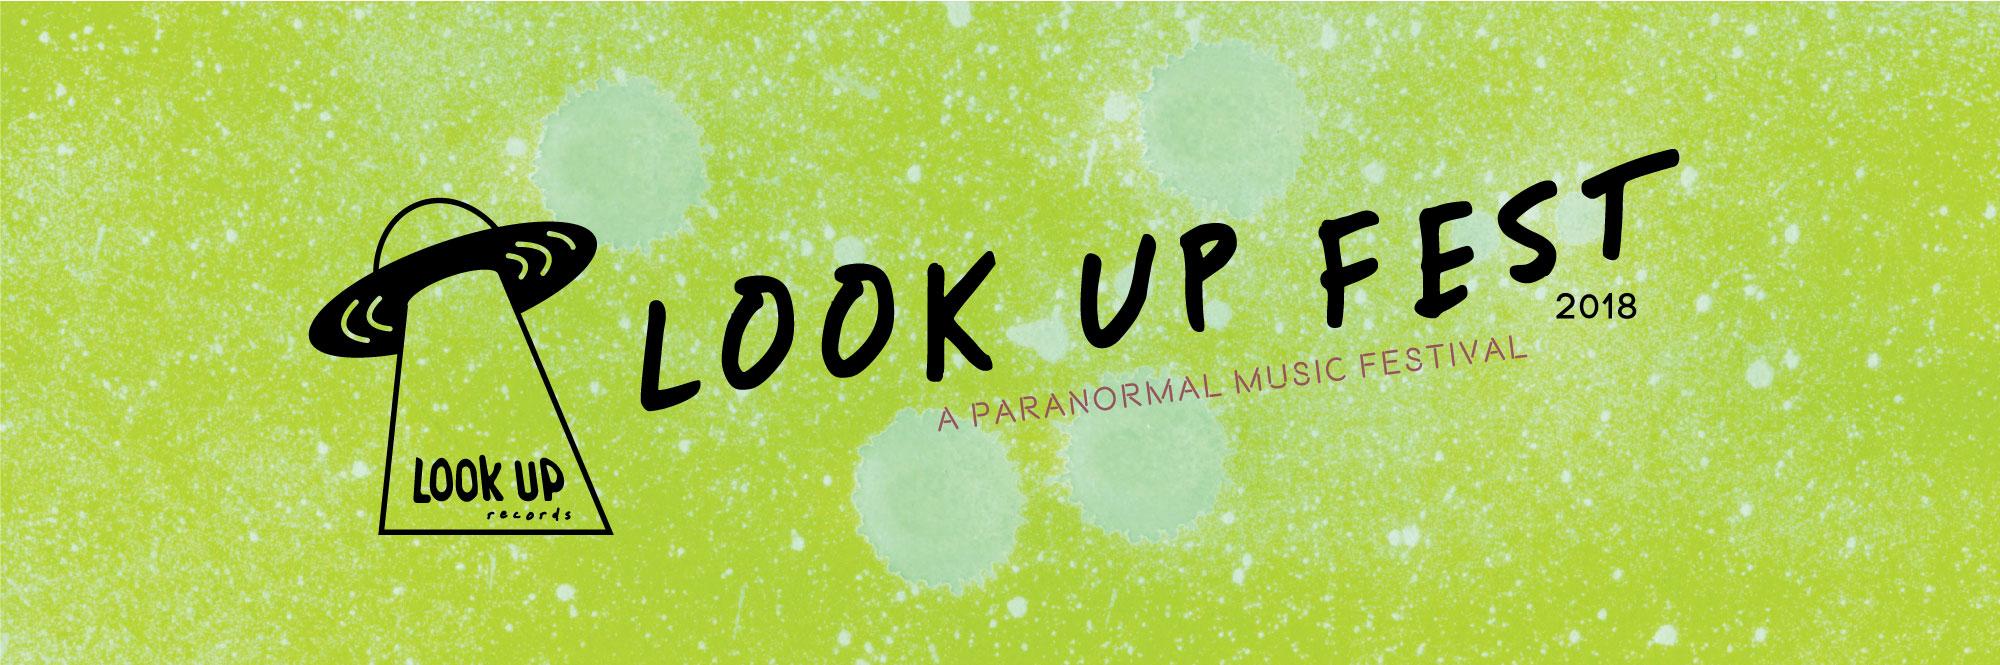 A-Parnormal-Music-Festival.jpg